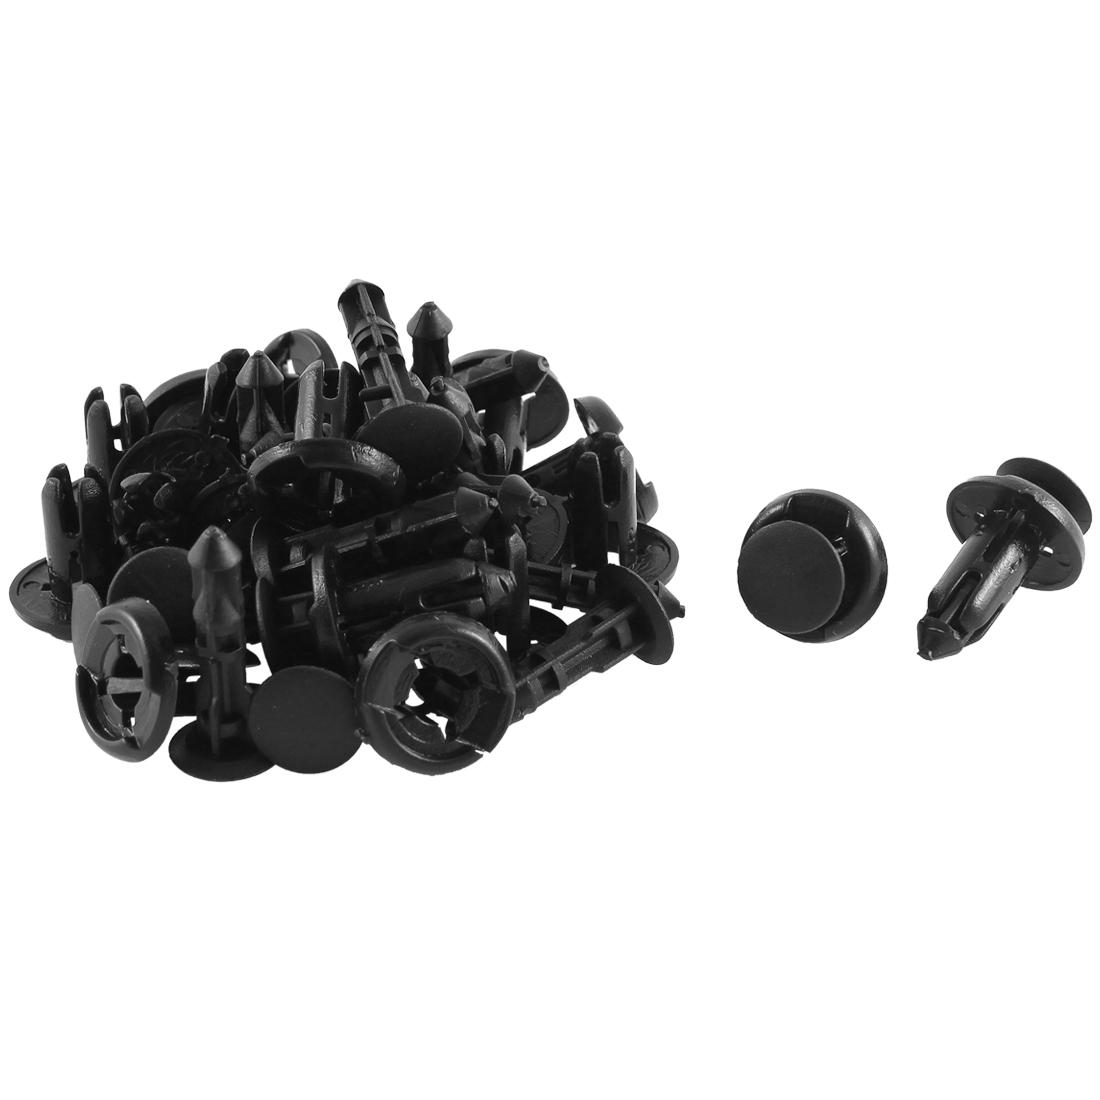 20 Pcs Black Plastic Splash Defender Push-Type Moulding Clips for Toyota